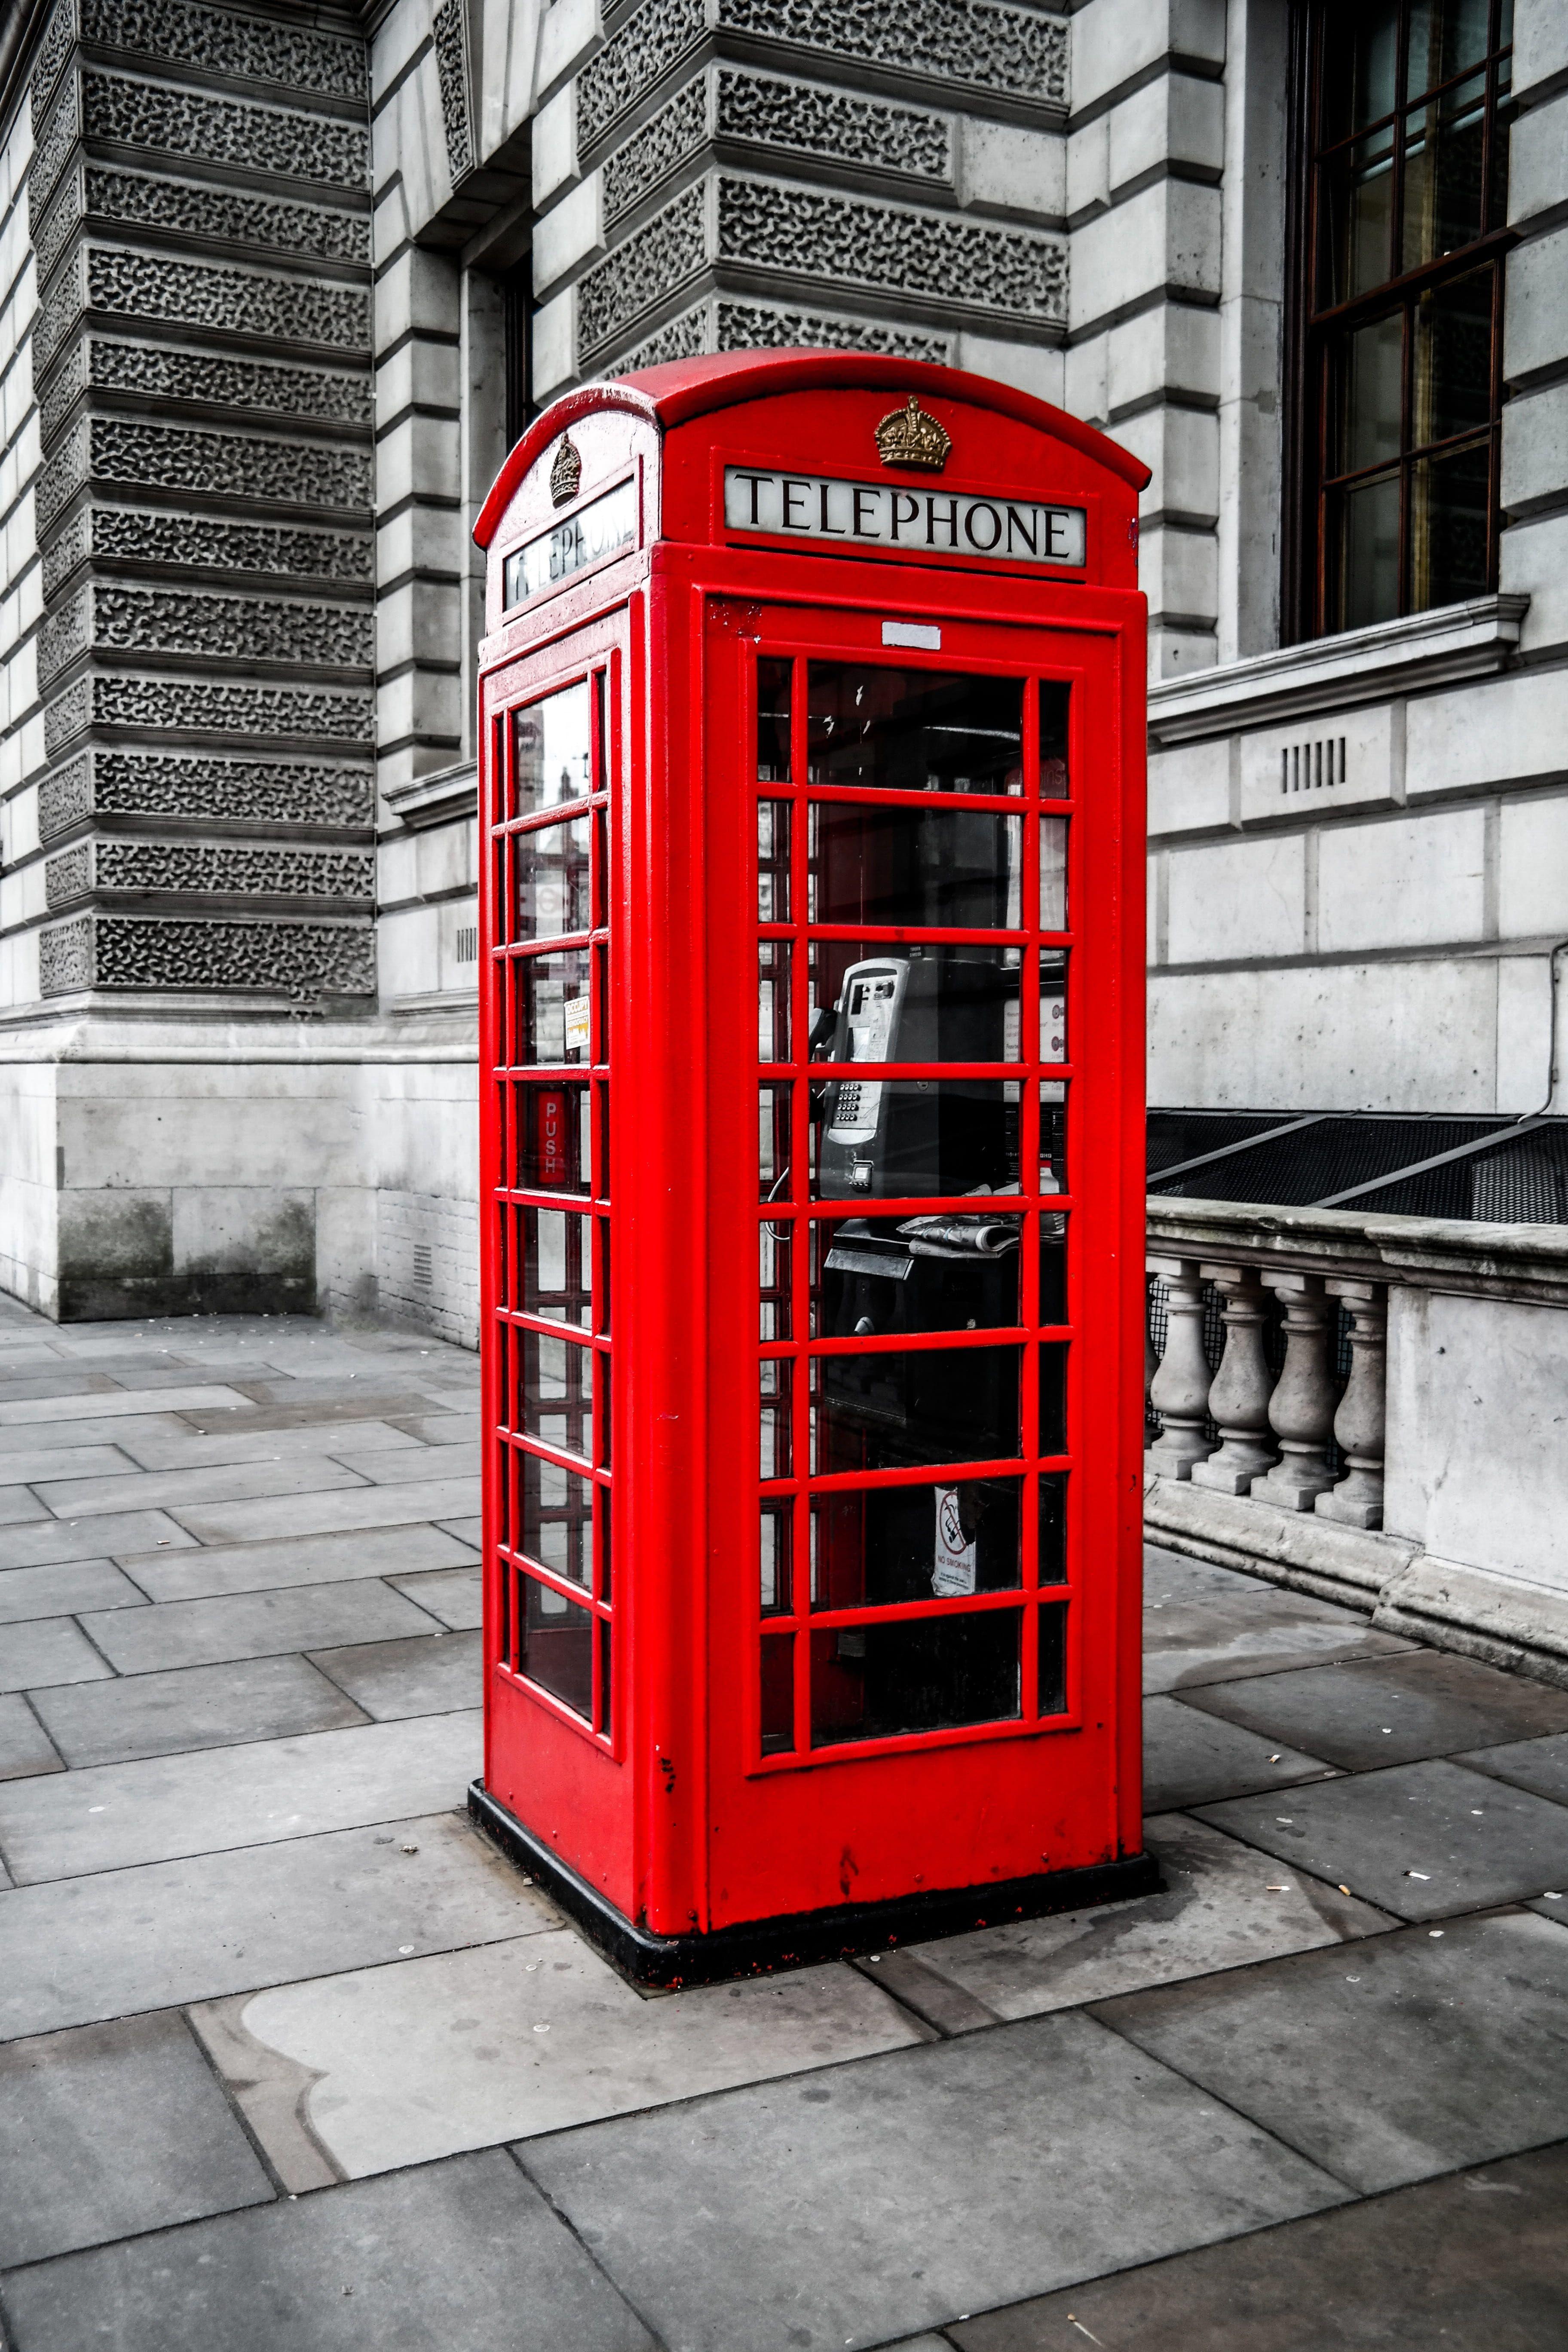 England Big Ben London Cabin Phone Cabin Phone Great Britain Architect Parliament United Kingdom Red Telephone Booth City Telephone Booth Big Ben Phone